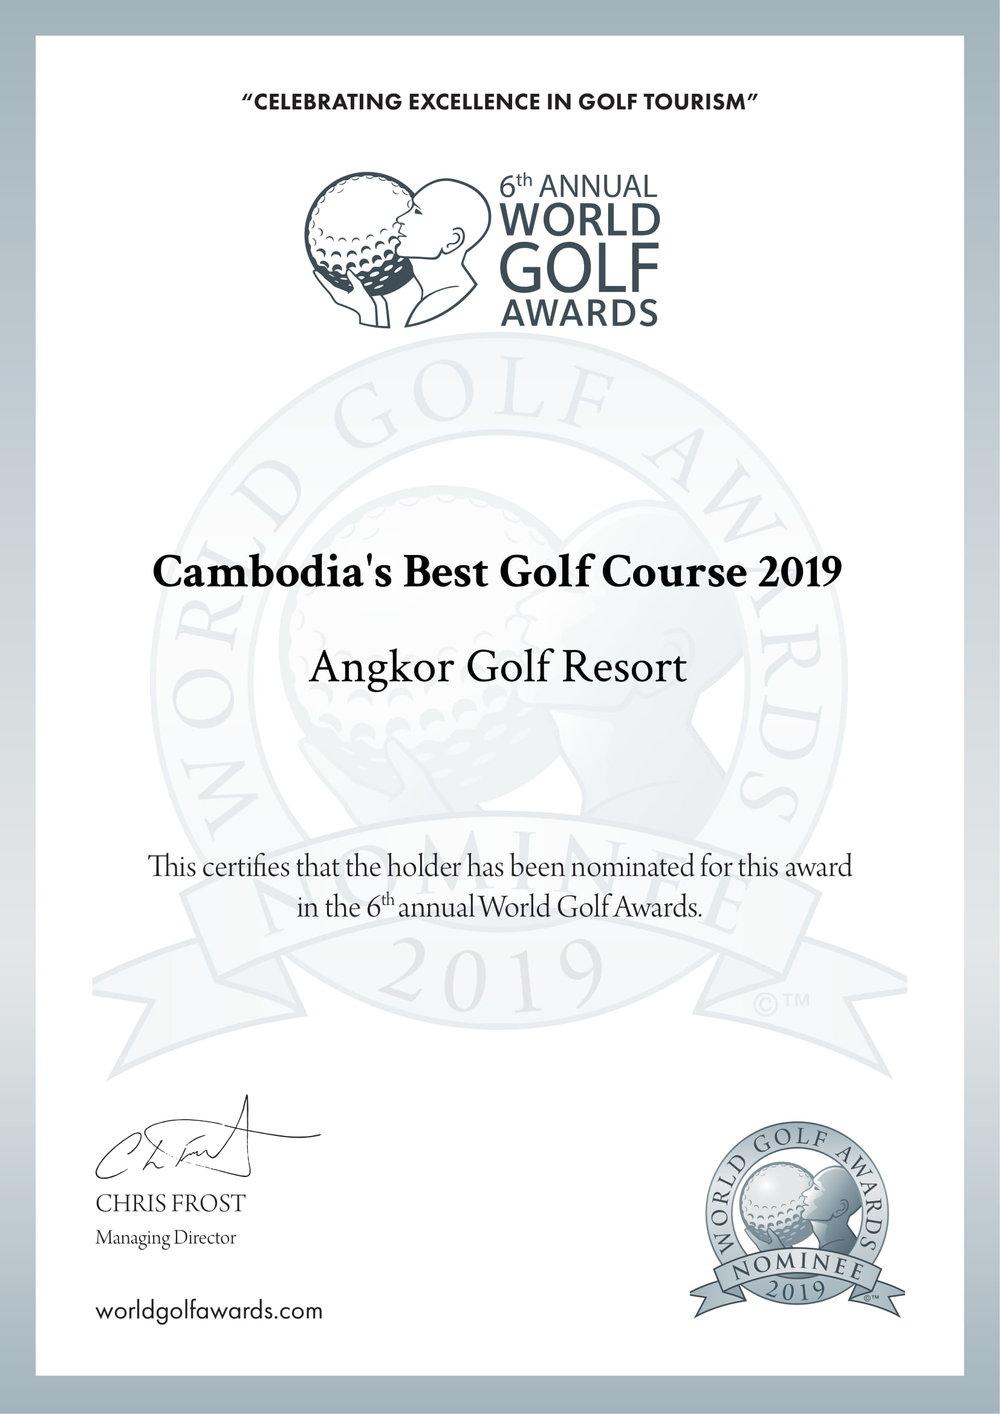 cambodias-best-golf-course-2019-nominee-certificate-colour.jpg